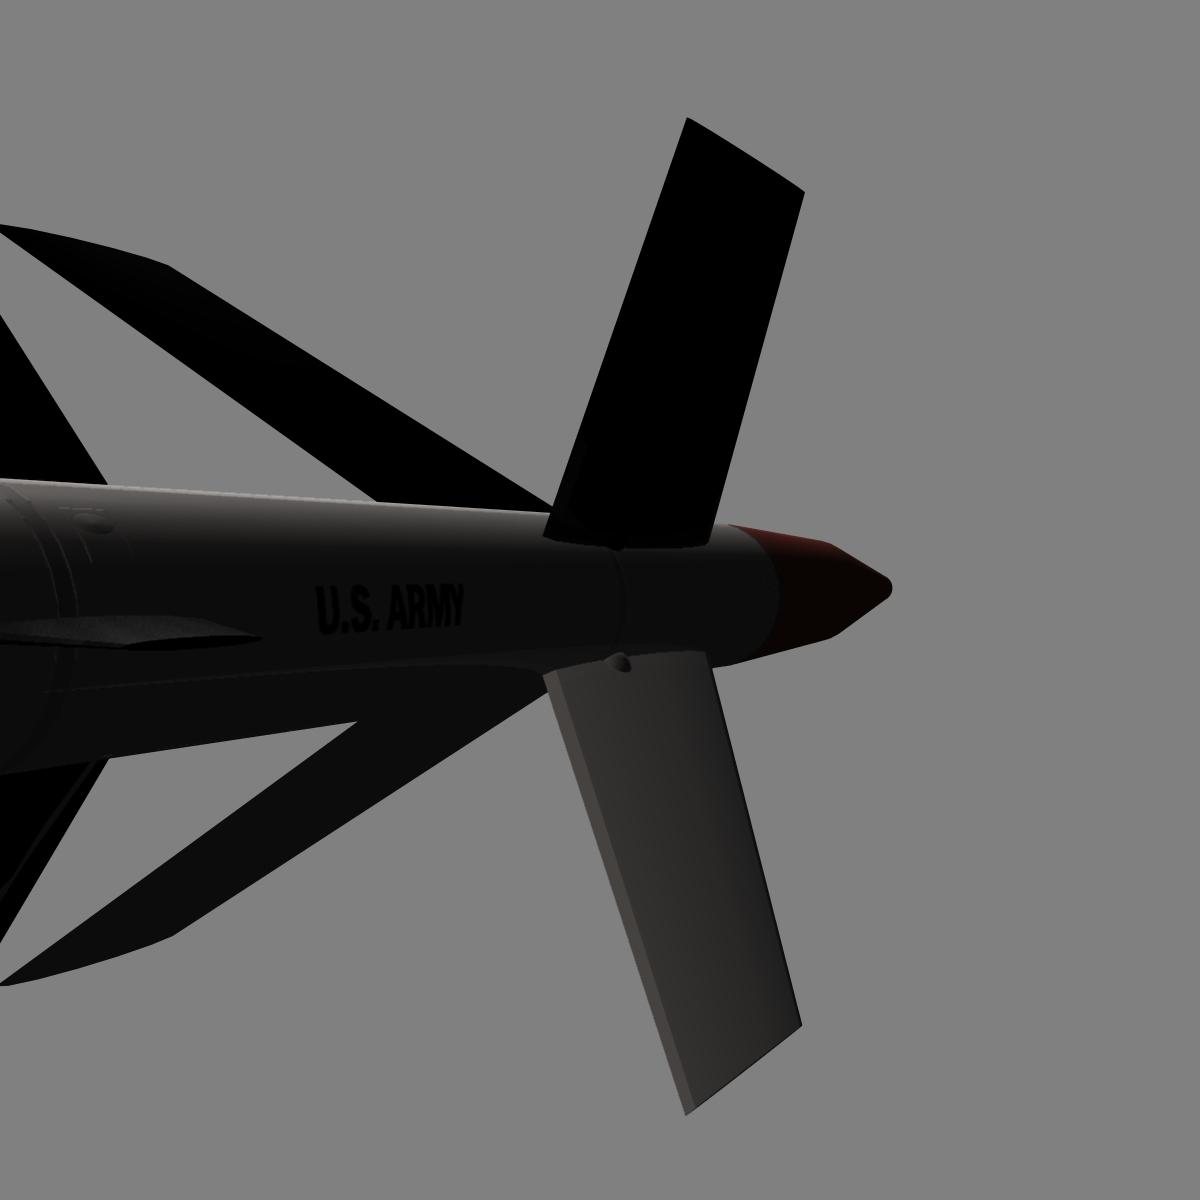 us mgm-18a raketa za lakros 3d model 3ds dxf cob x drugi obj 136521